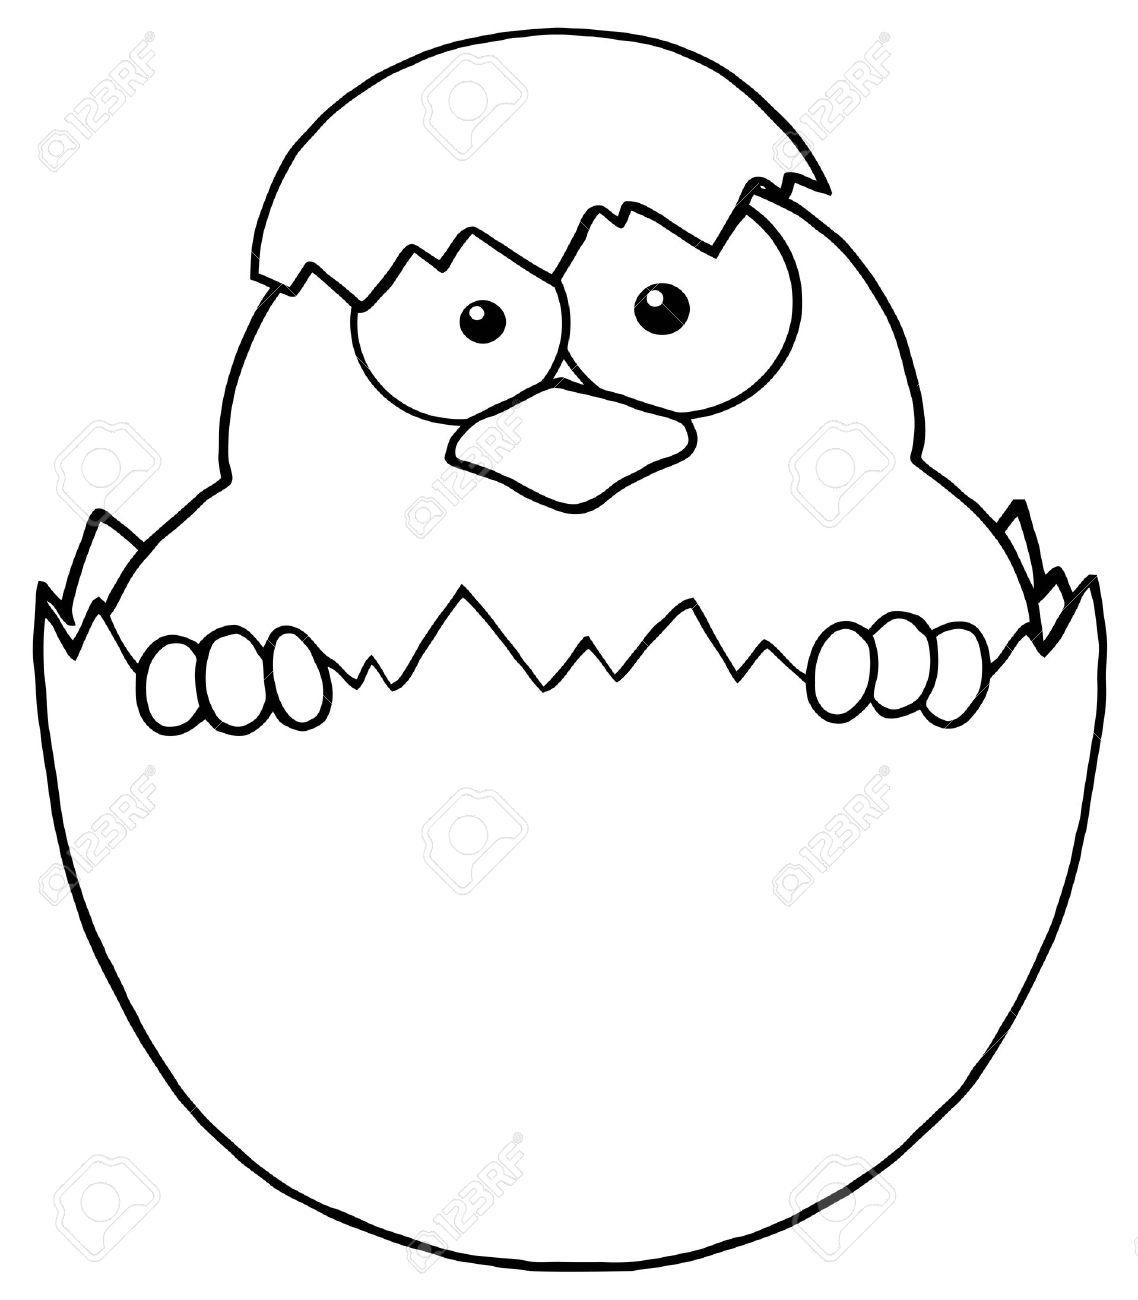 Cracked easter egg clipart. Free clip art of